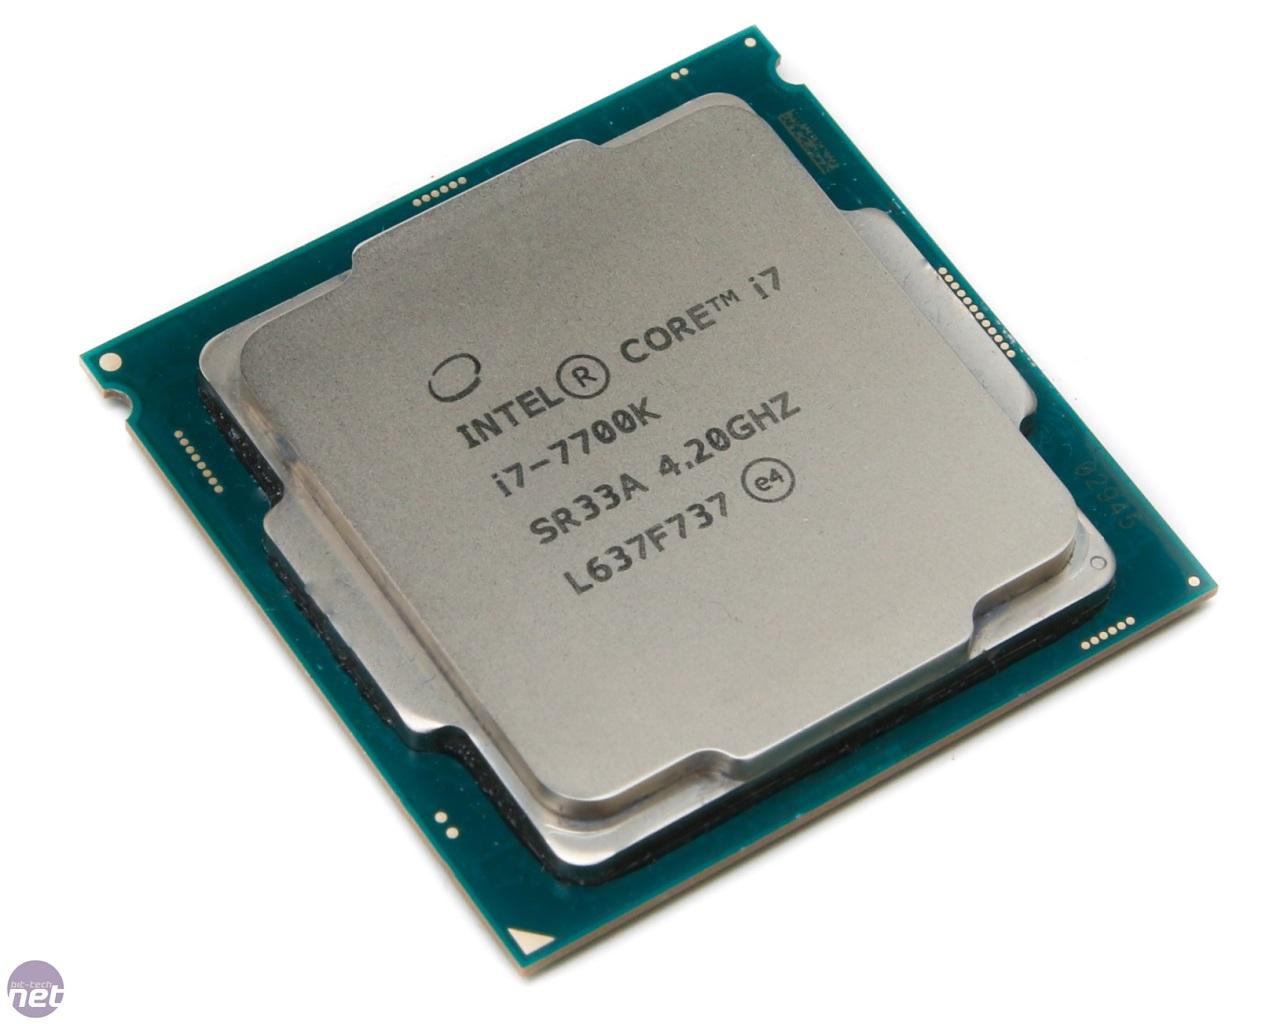 7700k 1 1280x1024 - Intel Core 7th Generation Core 7700K Kaby Lake CPU Price Check